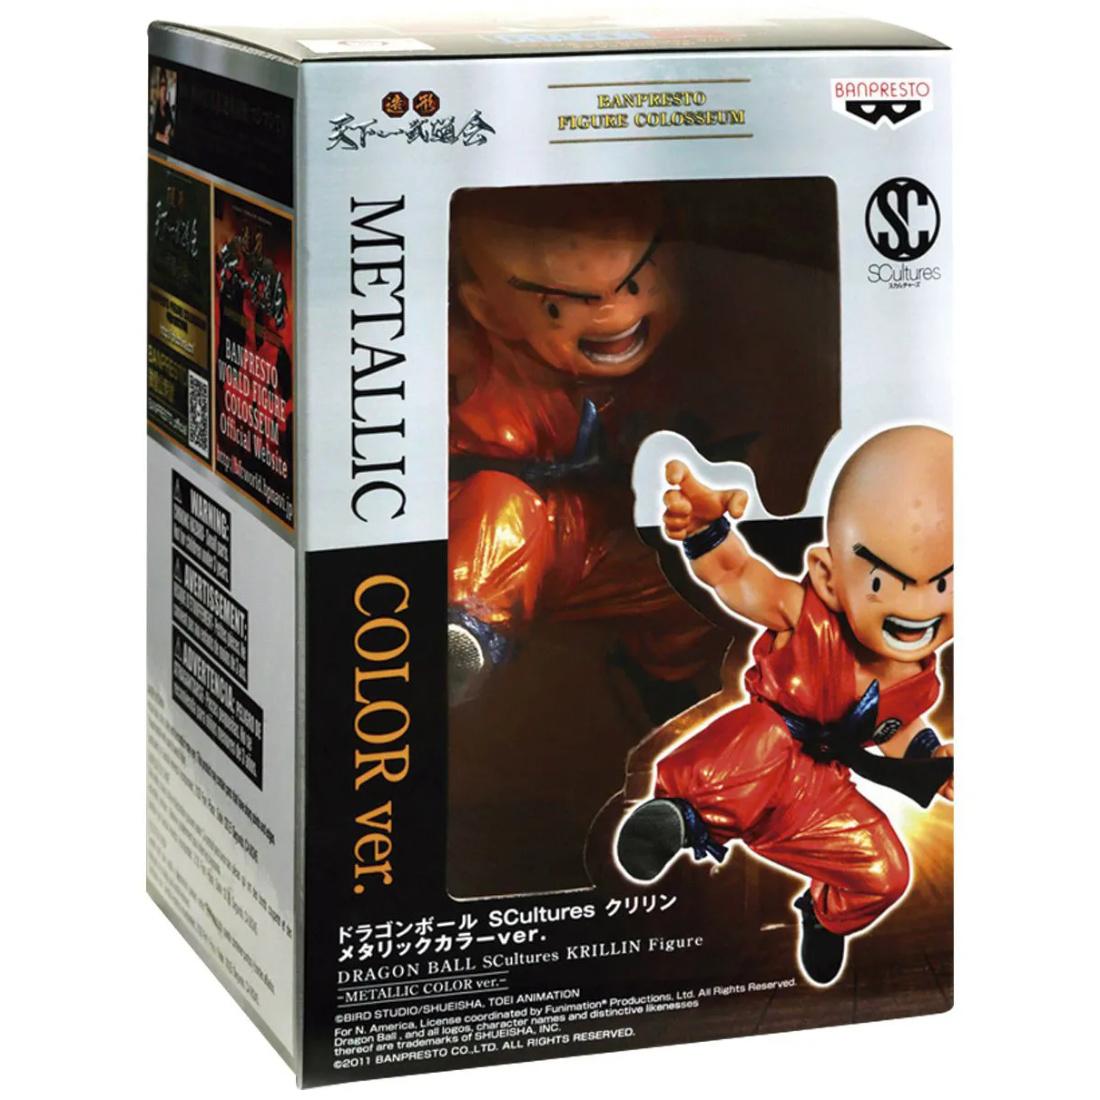 Banpresto Dragon Ball SCultures Metallic Color Ver. Krillin